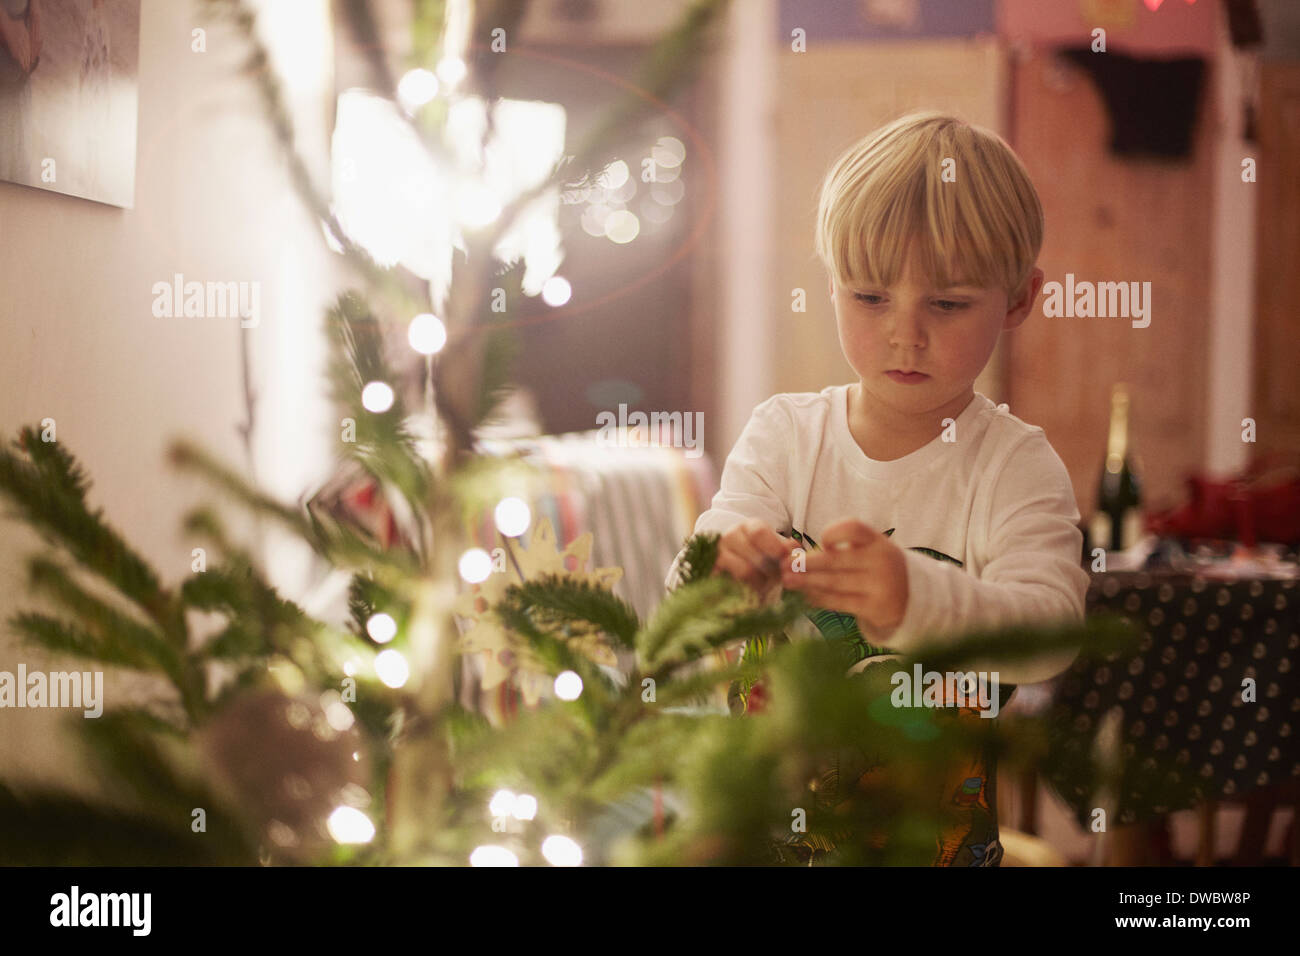 Young boy decorating christmas tree - Stock Image